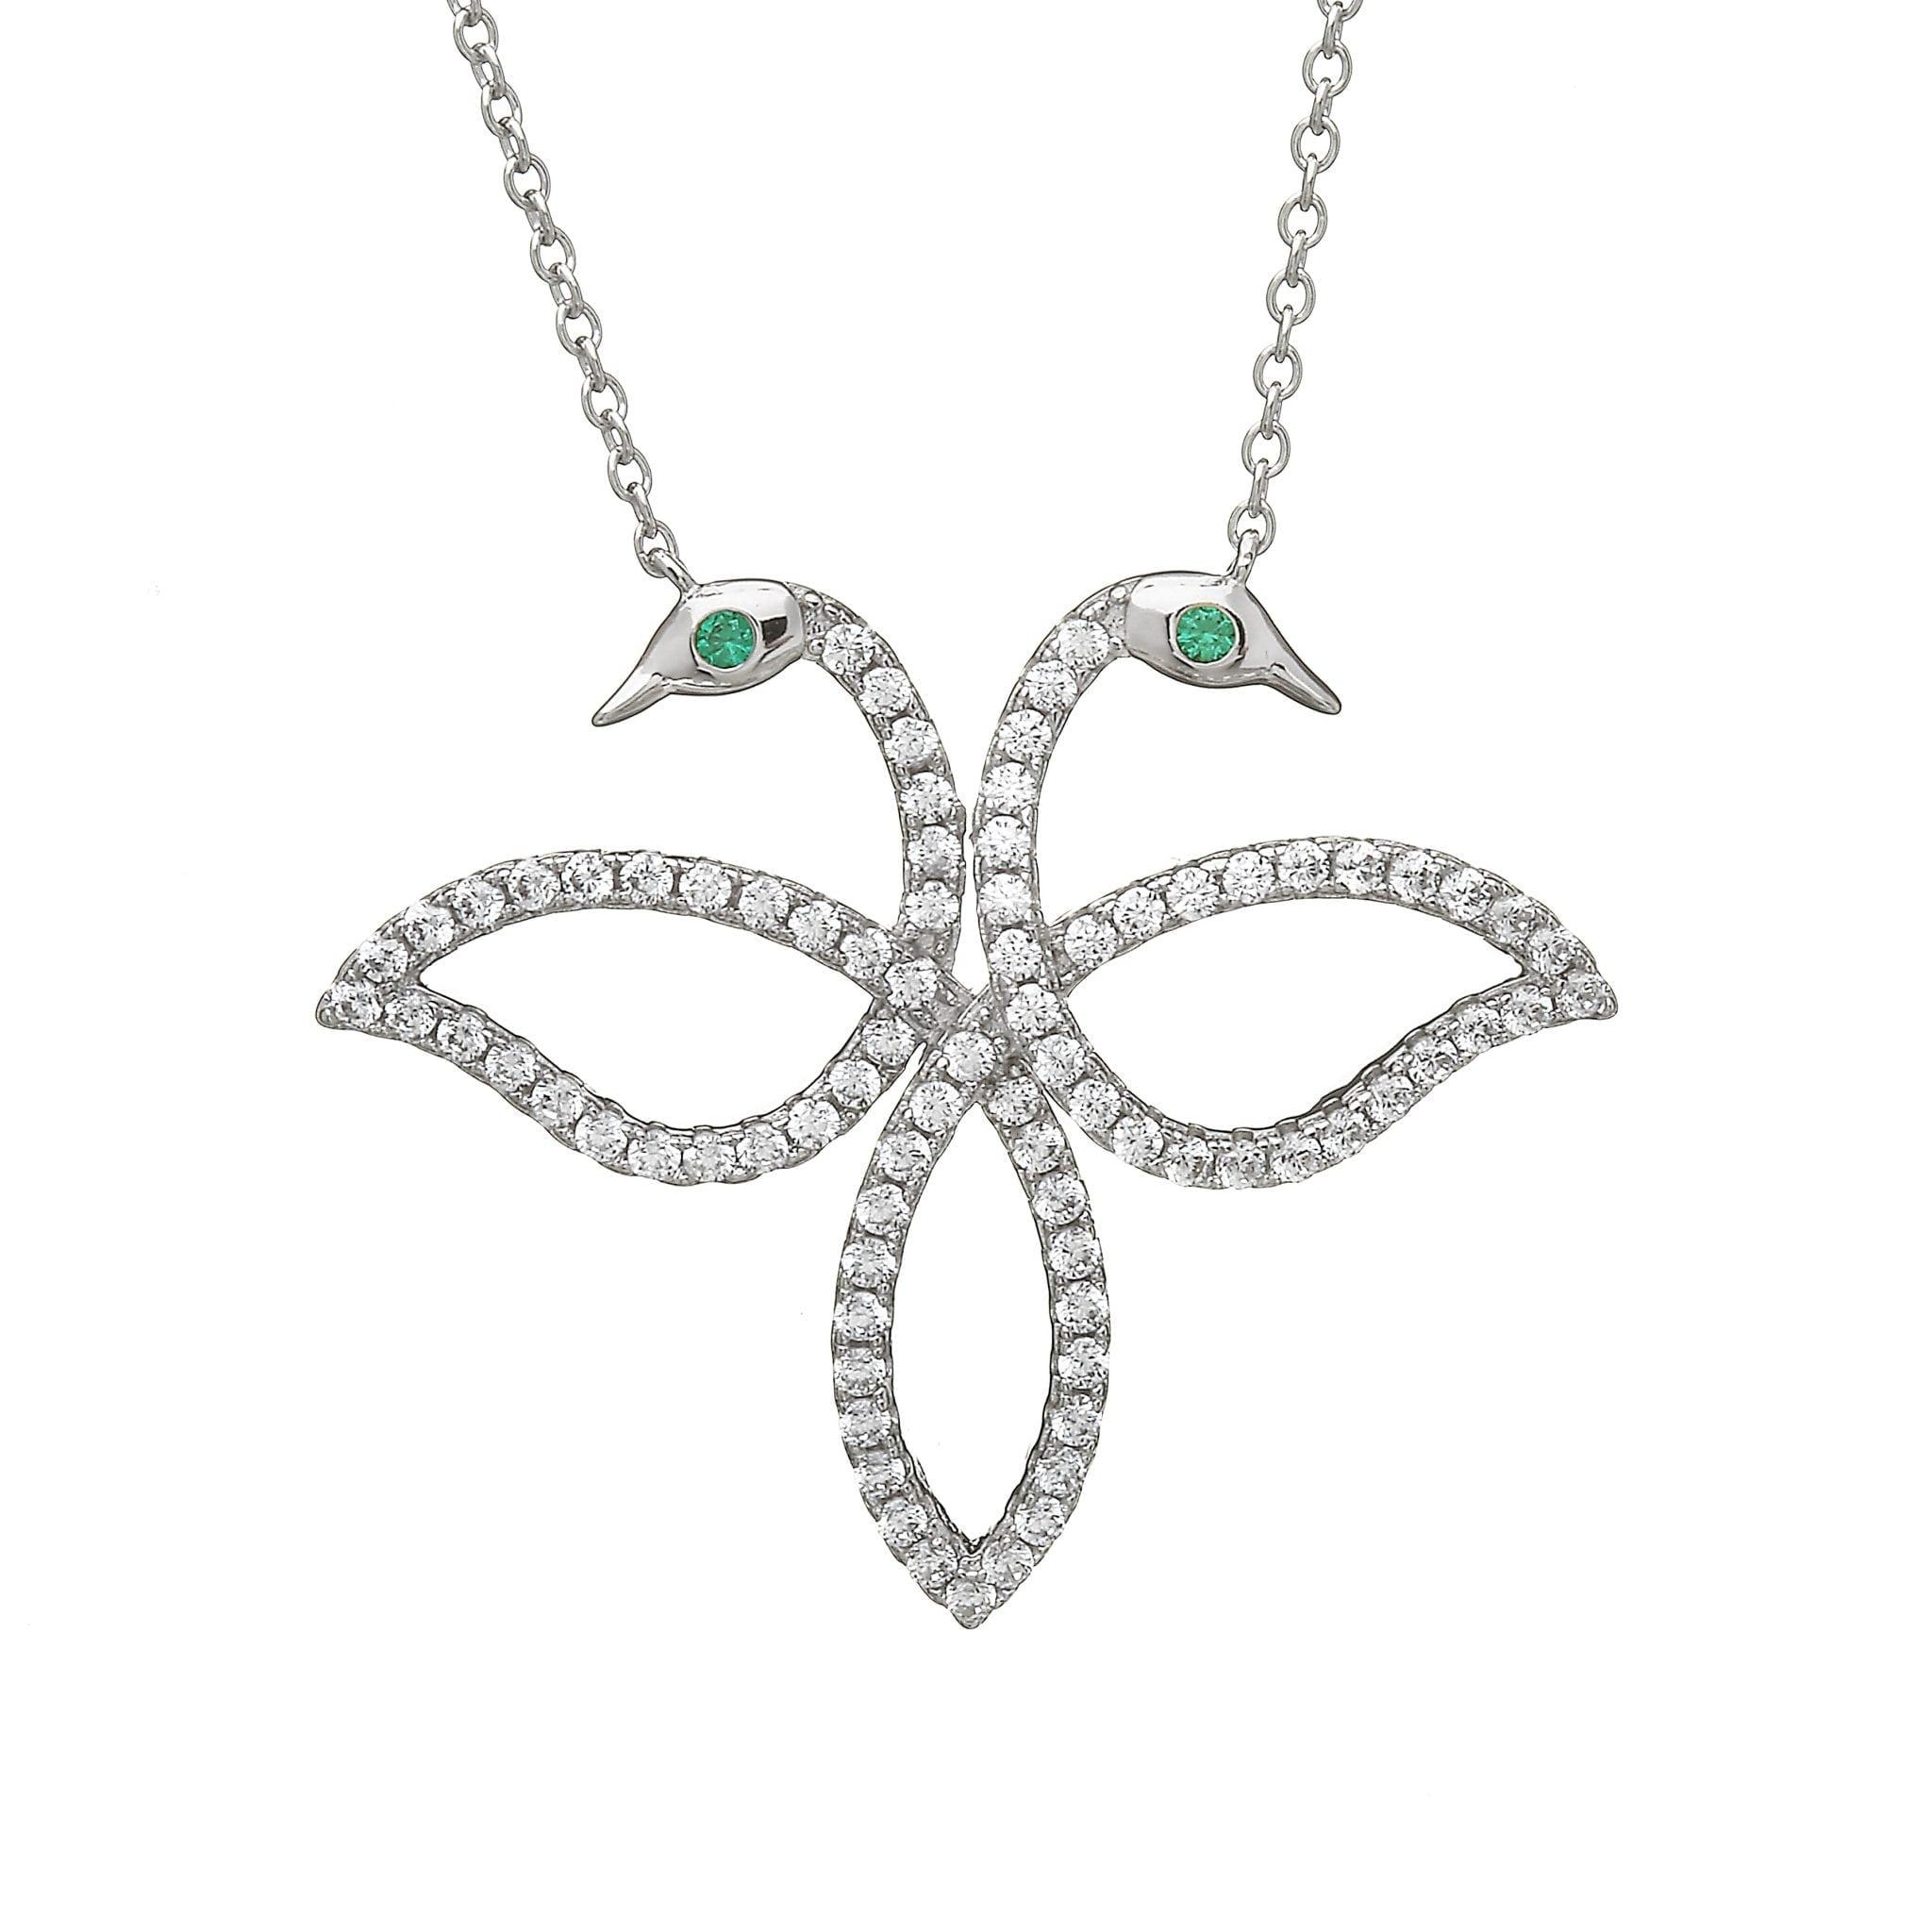 Large Legend Of Lir Contemporary Necklace